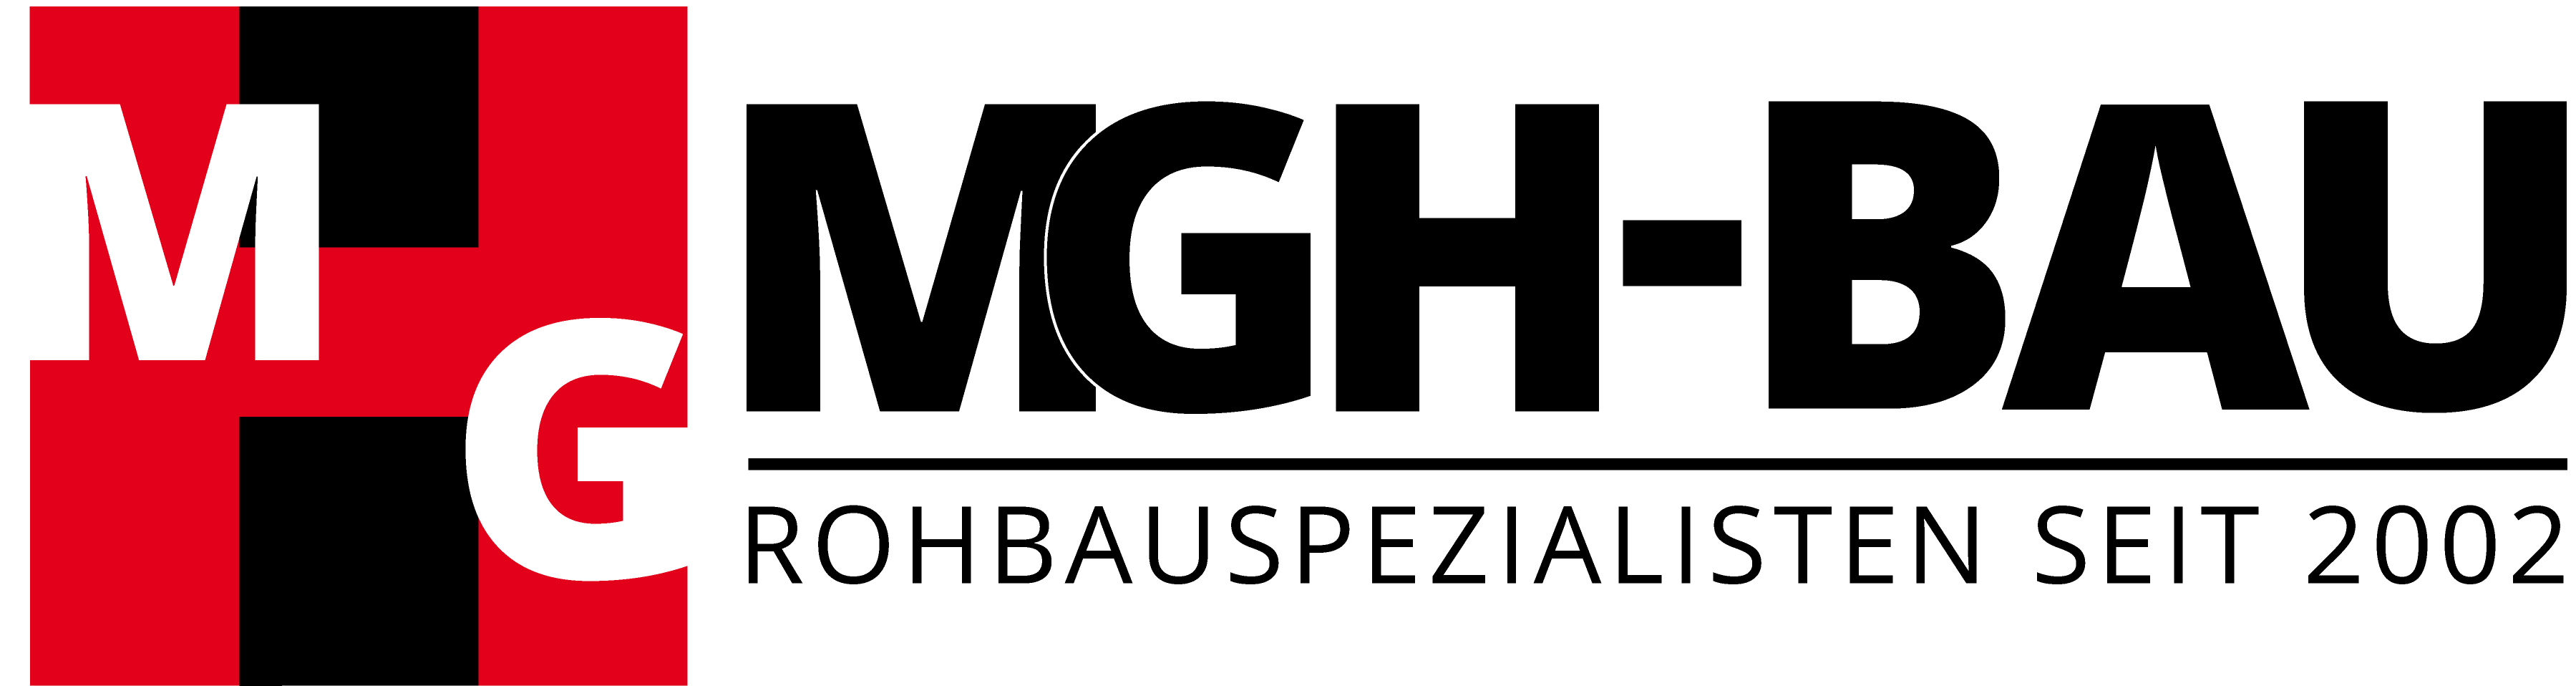 mgh-logo